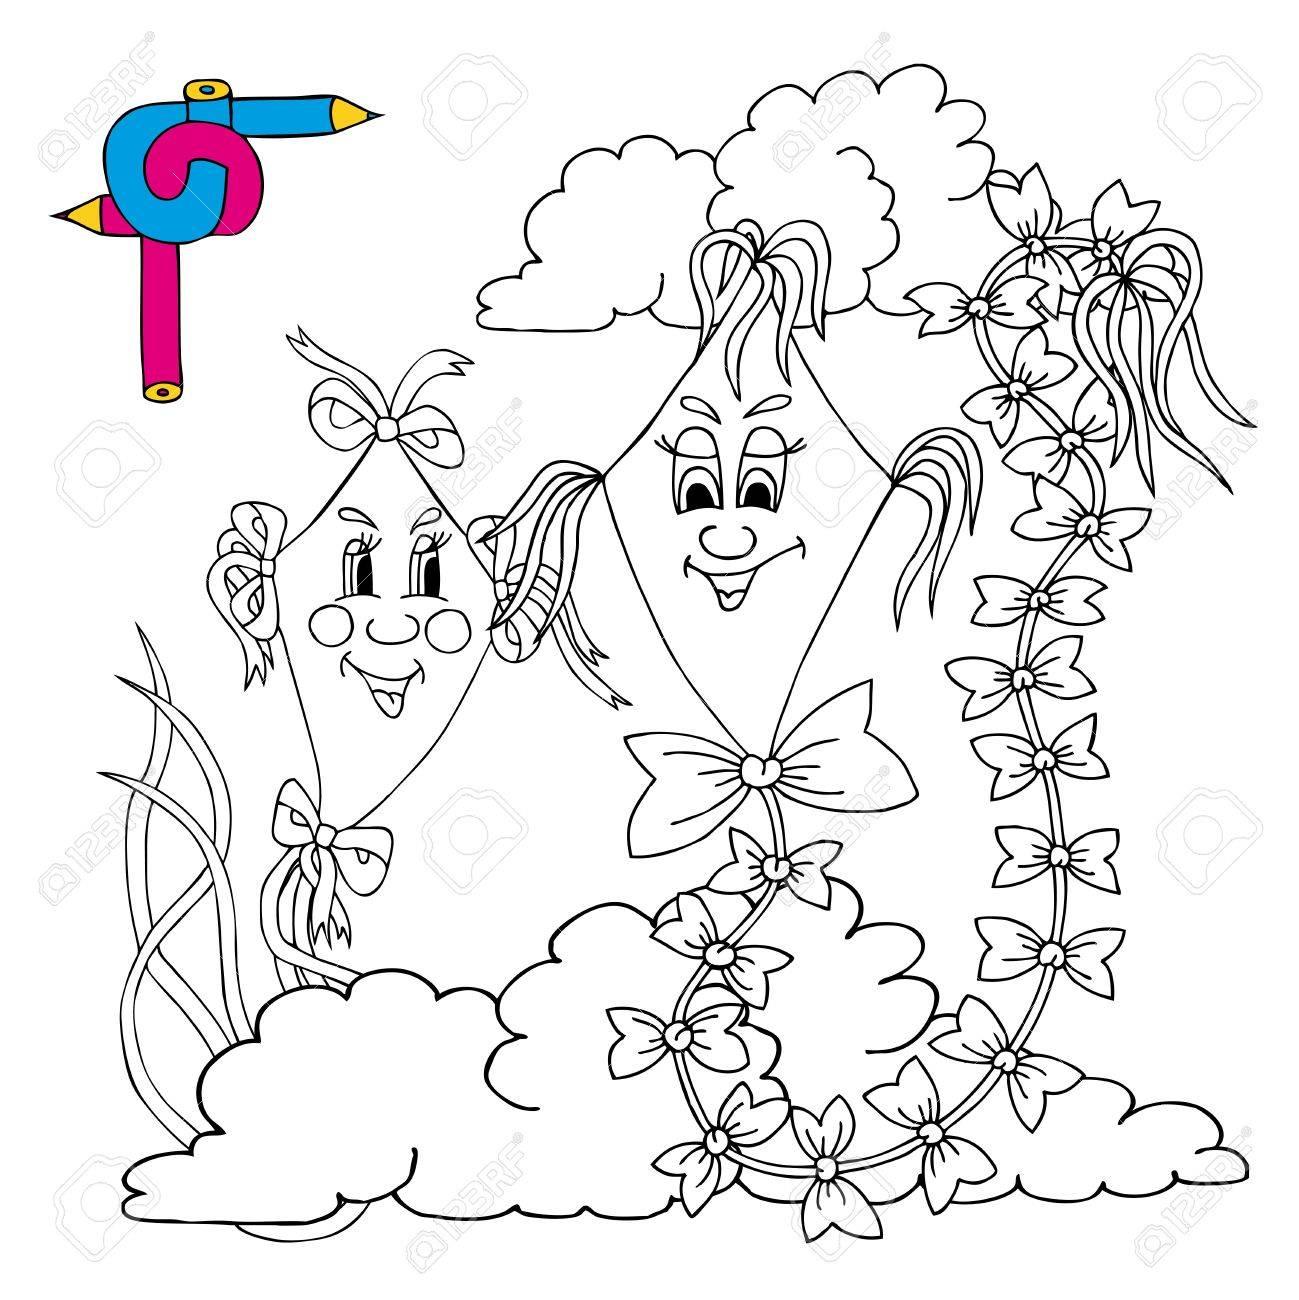 coloring image kites vector illustration royalty free cliparts